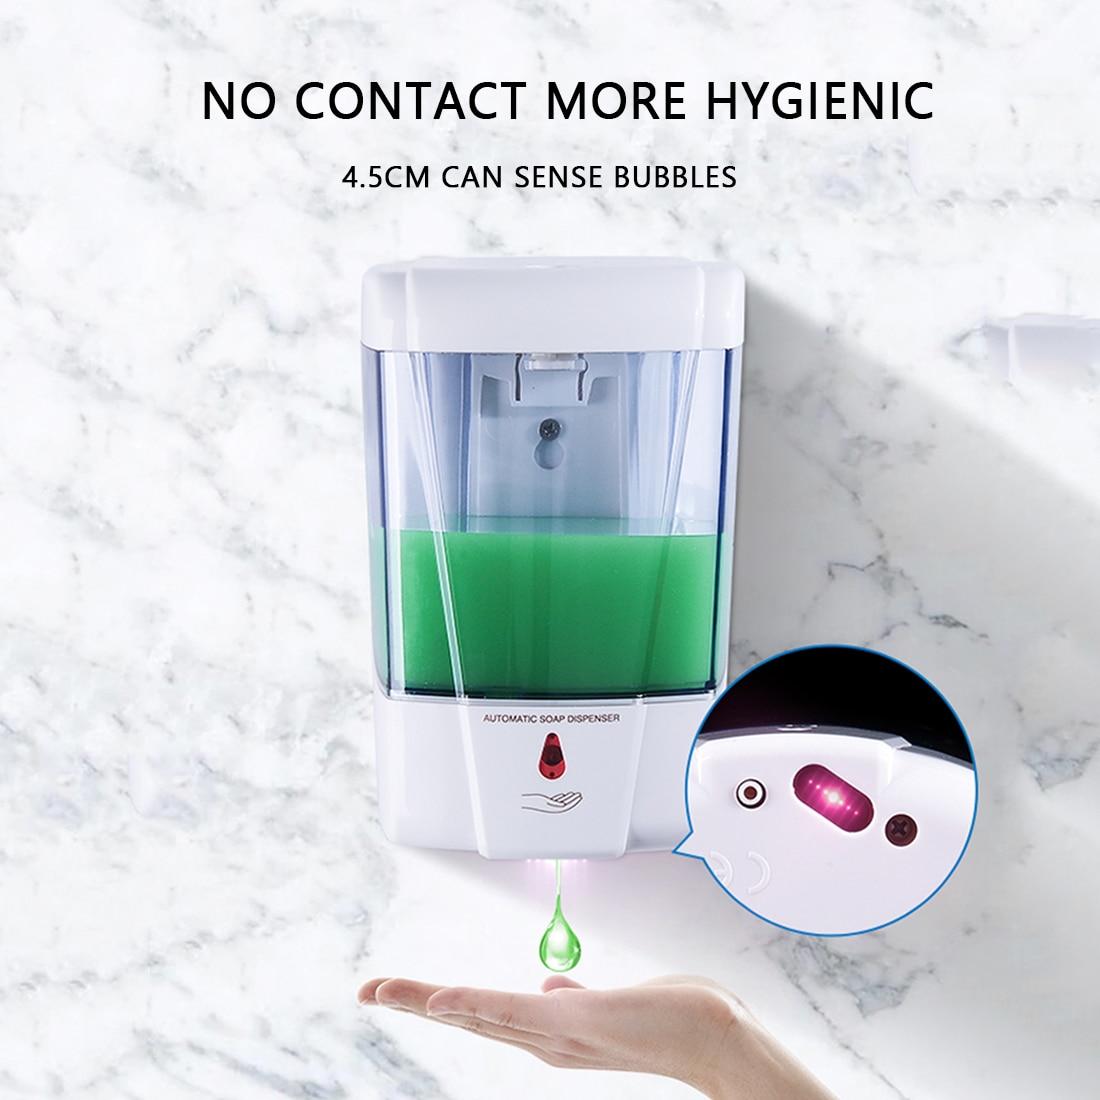 700 Ml Automatic Sensor Soap Dispenser Wall-Mount Soap Dispenser Touchless Soap Dispenser Battery Powered For Kitchen Bathroom